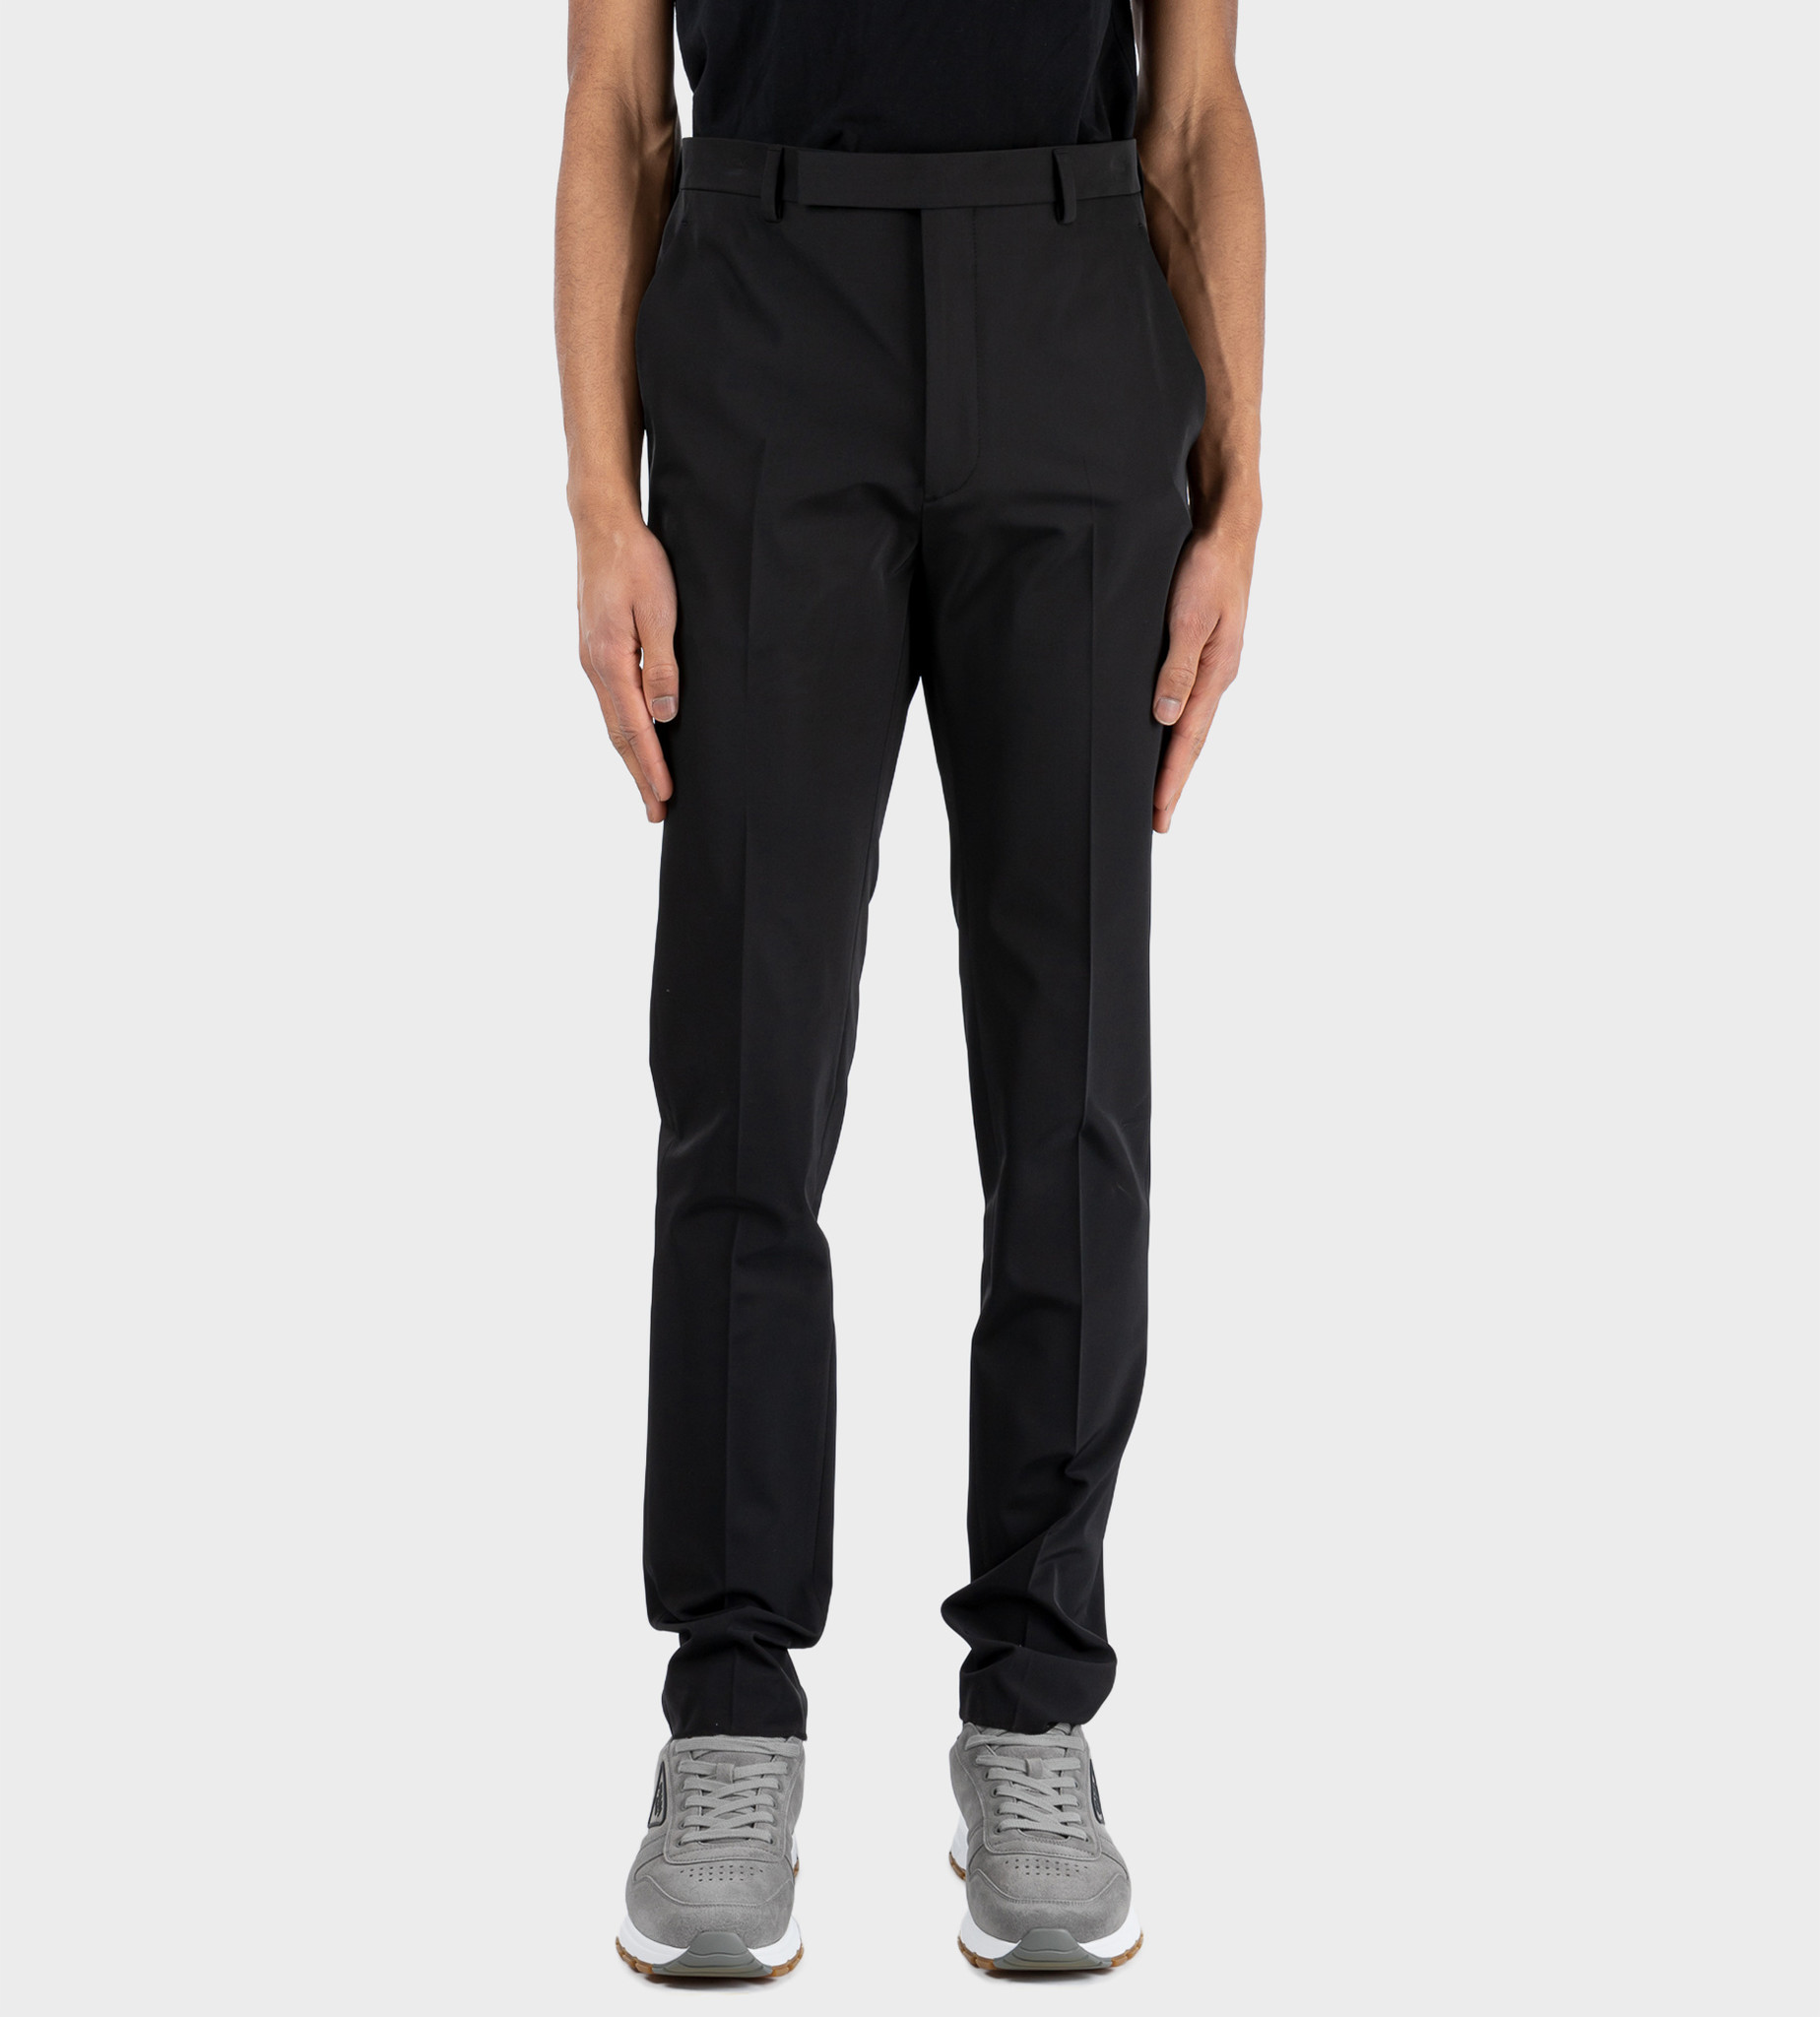 PRADA Techno Stretch Pants Black